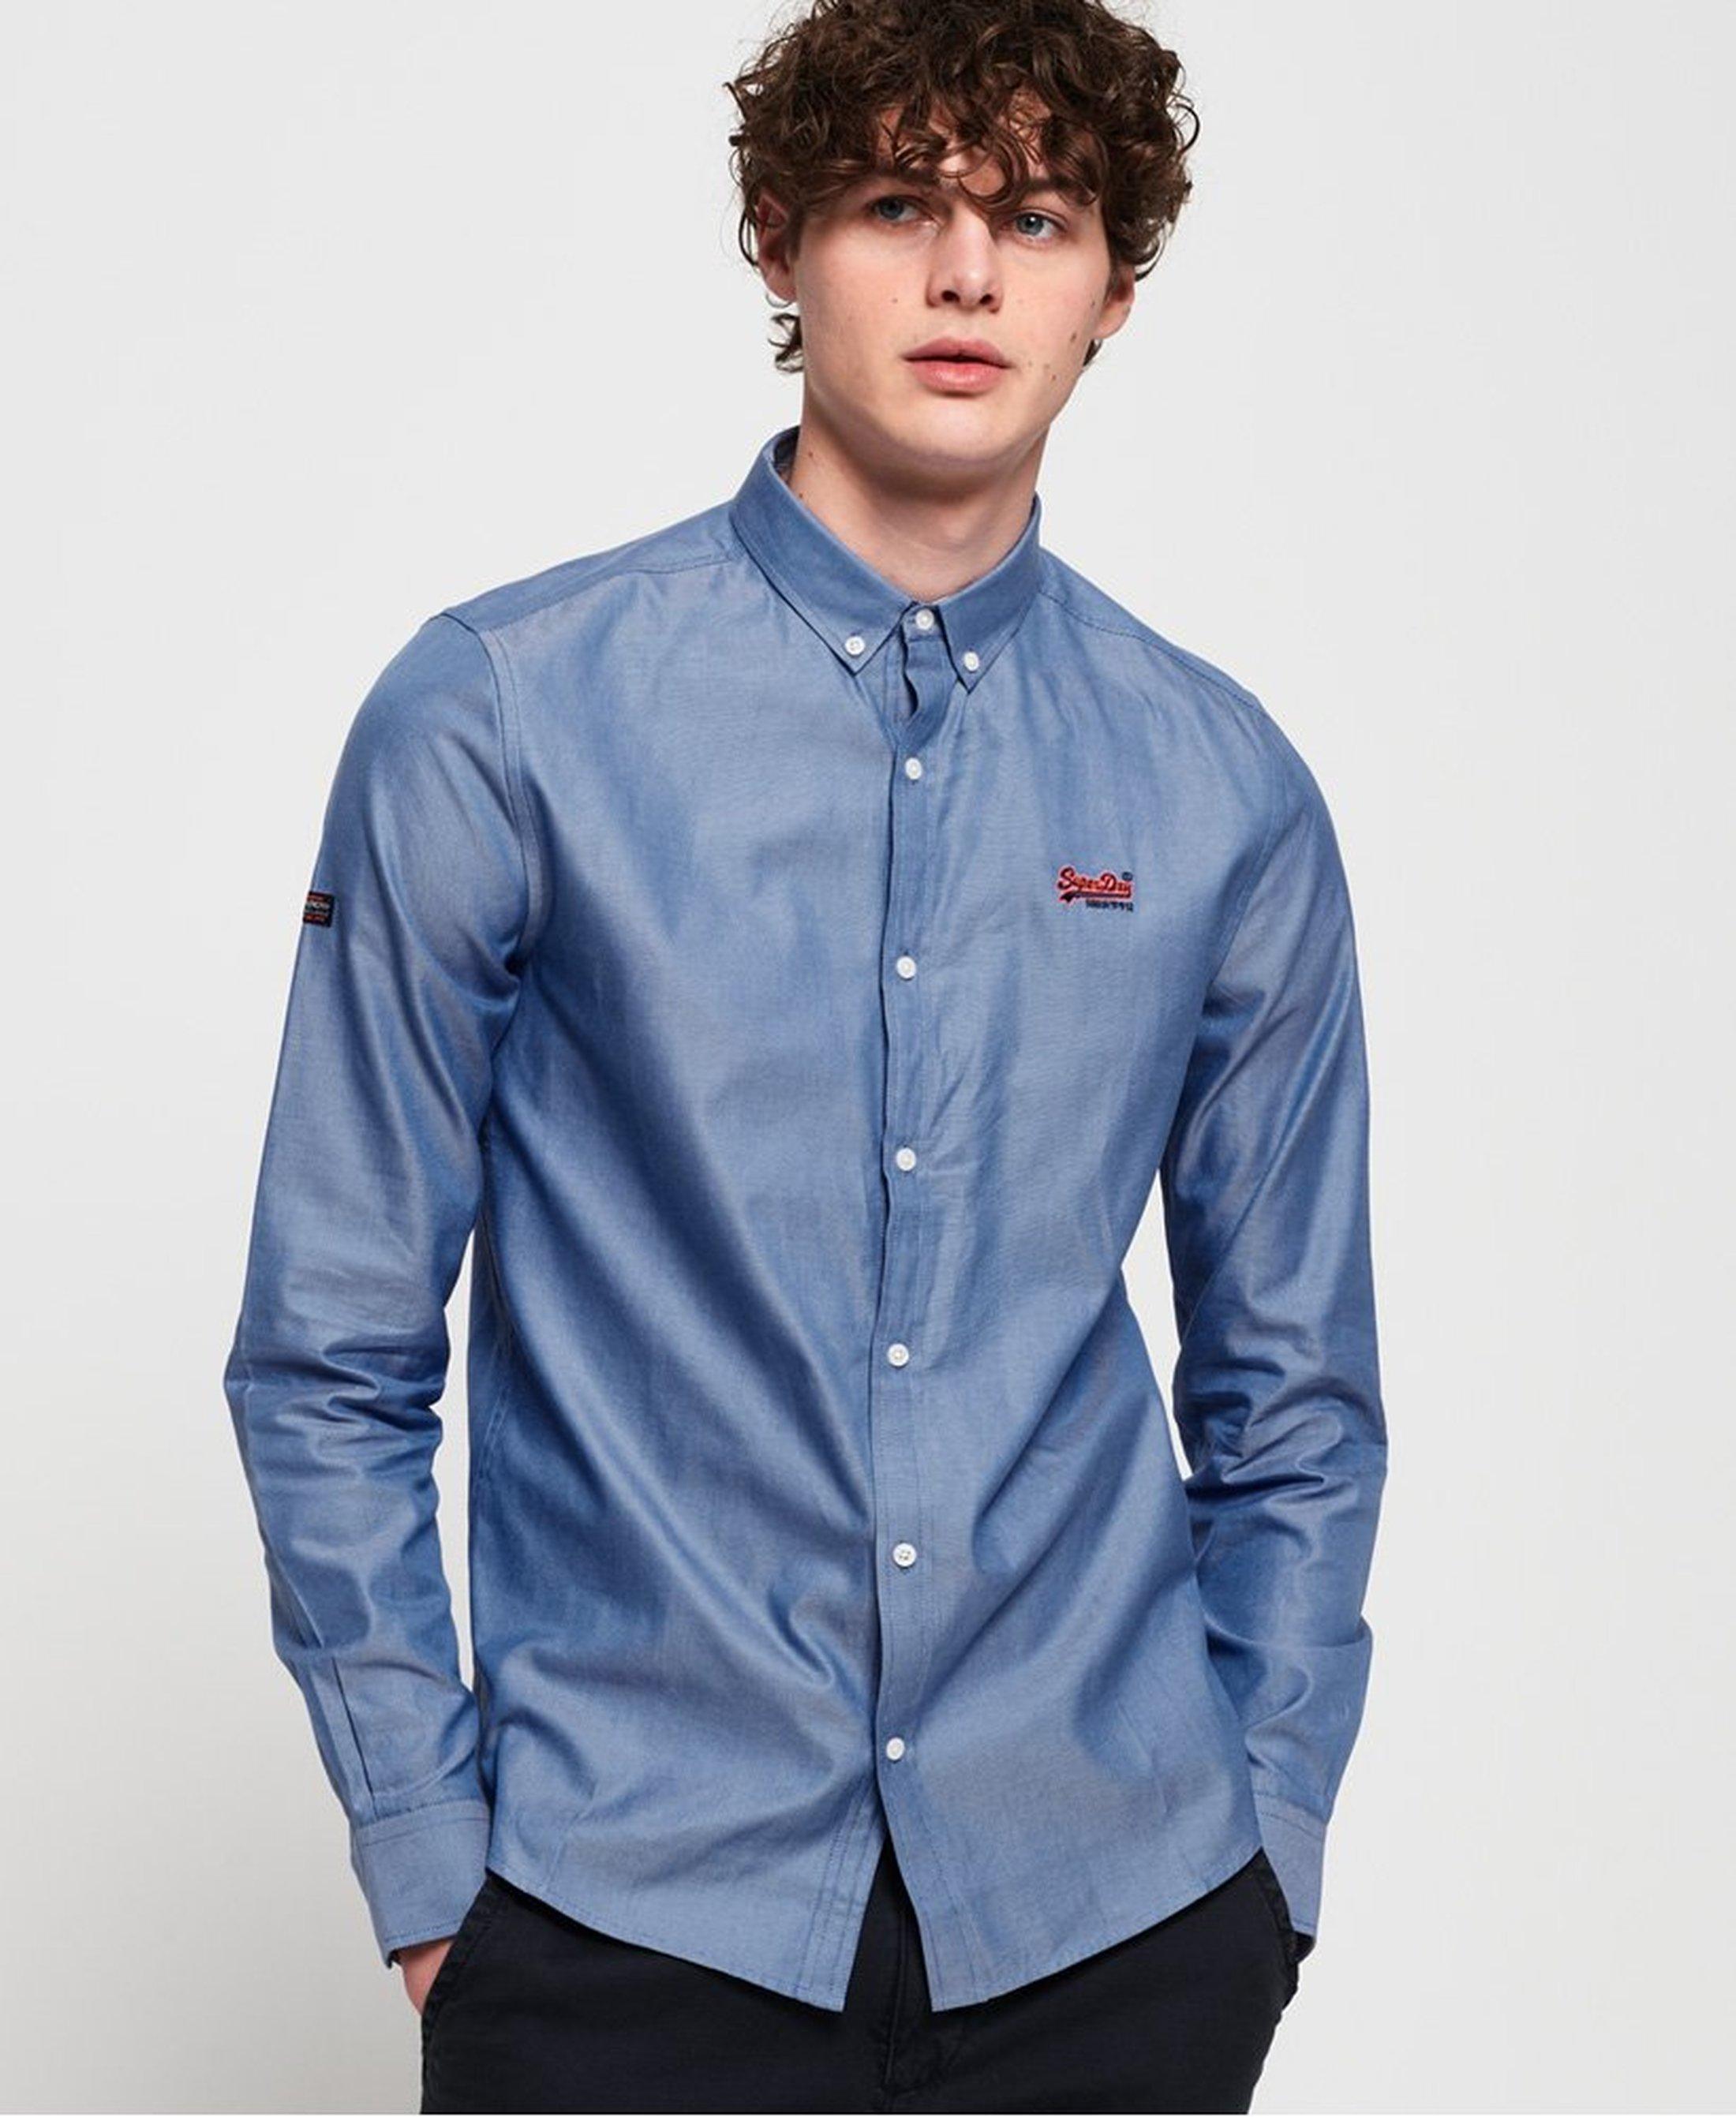 Superdry Overhemd Blauw foto 5